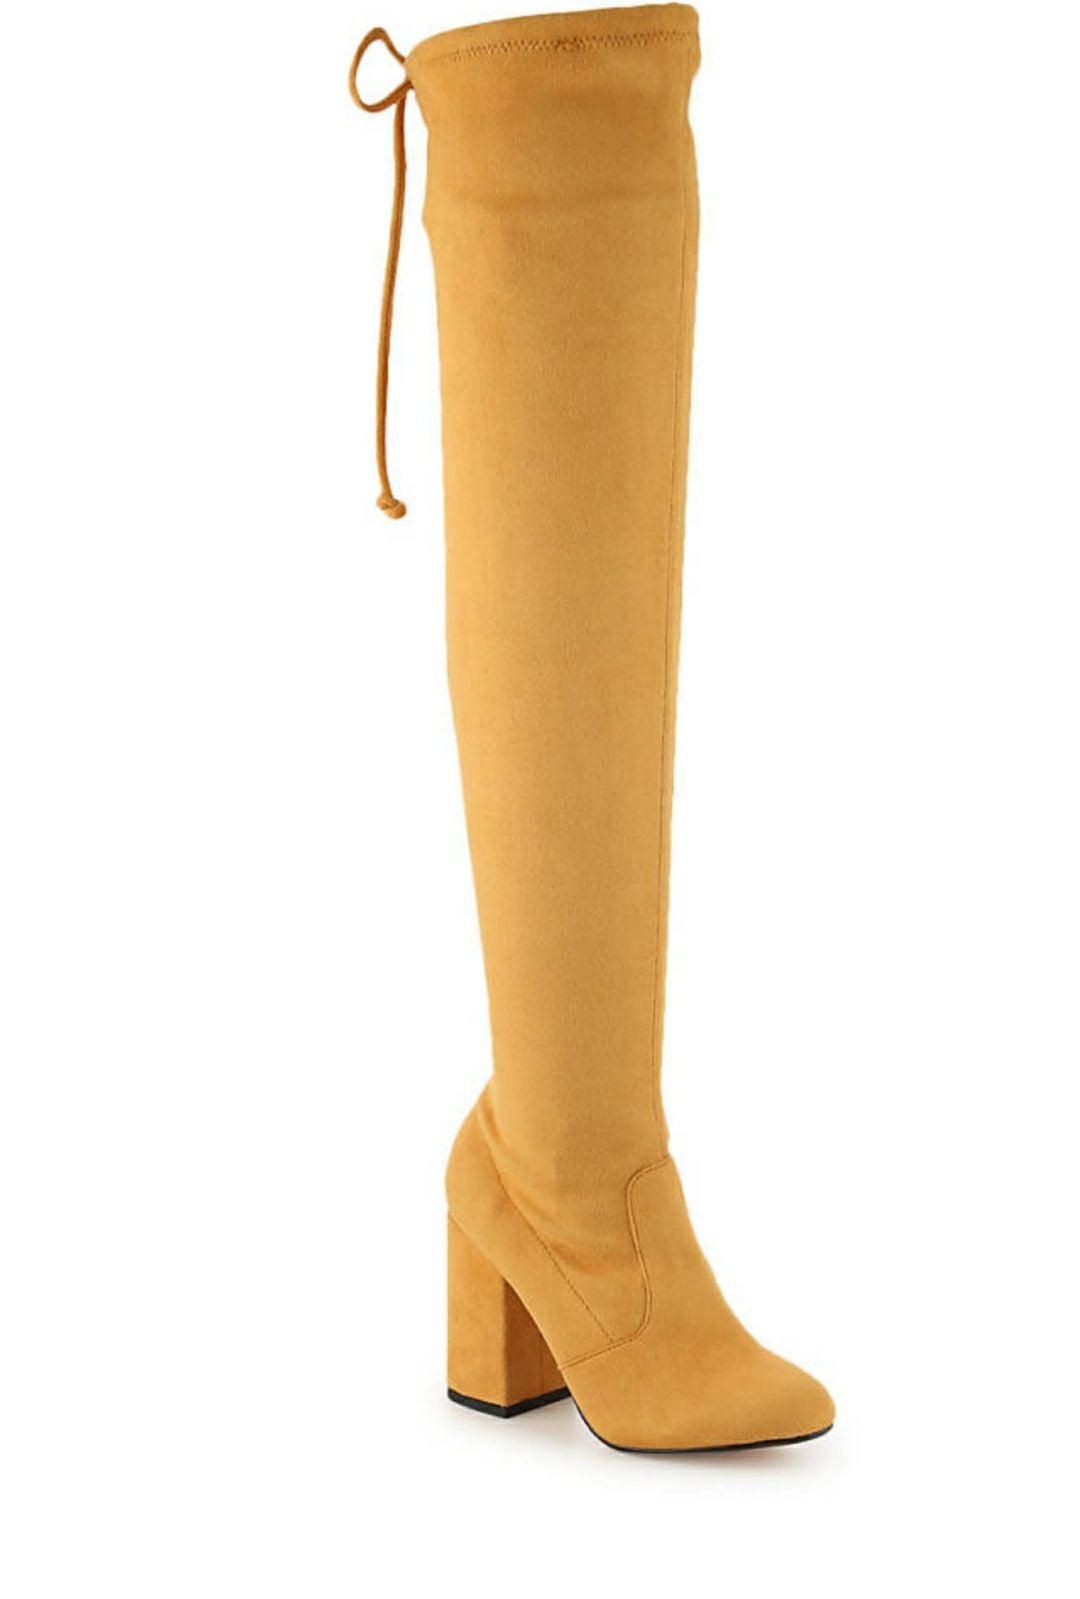 Privileged Thigh High Boots